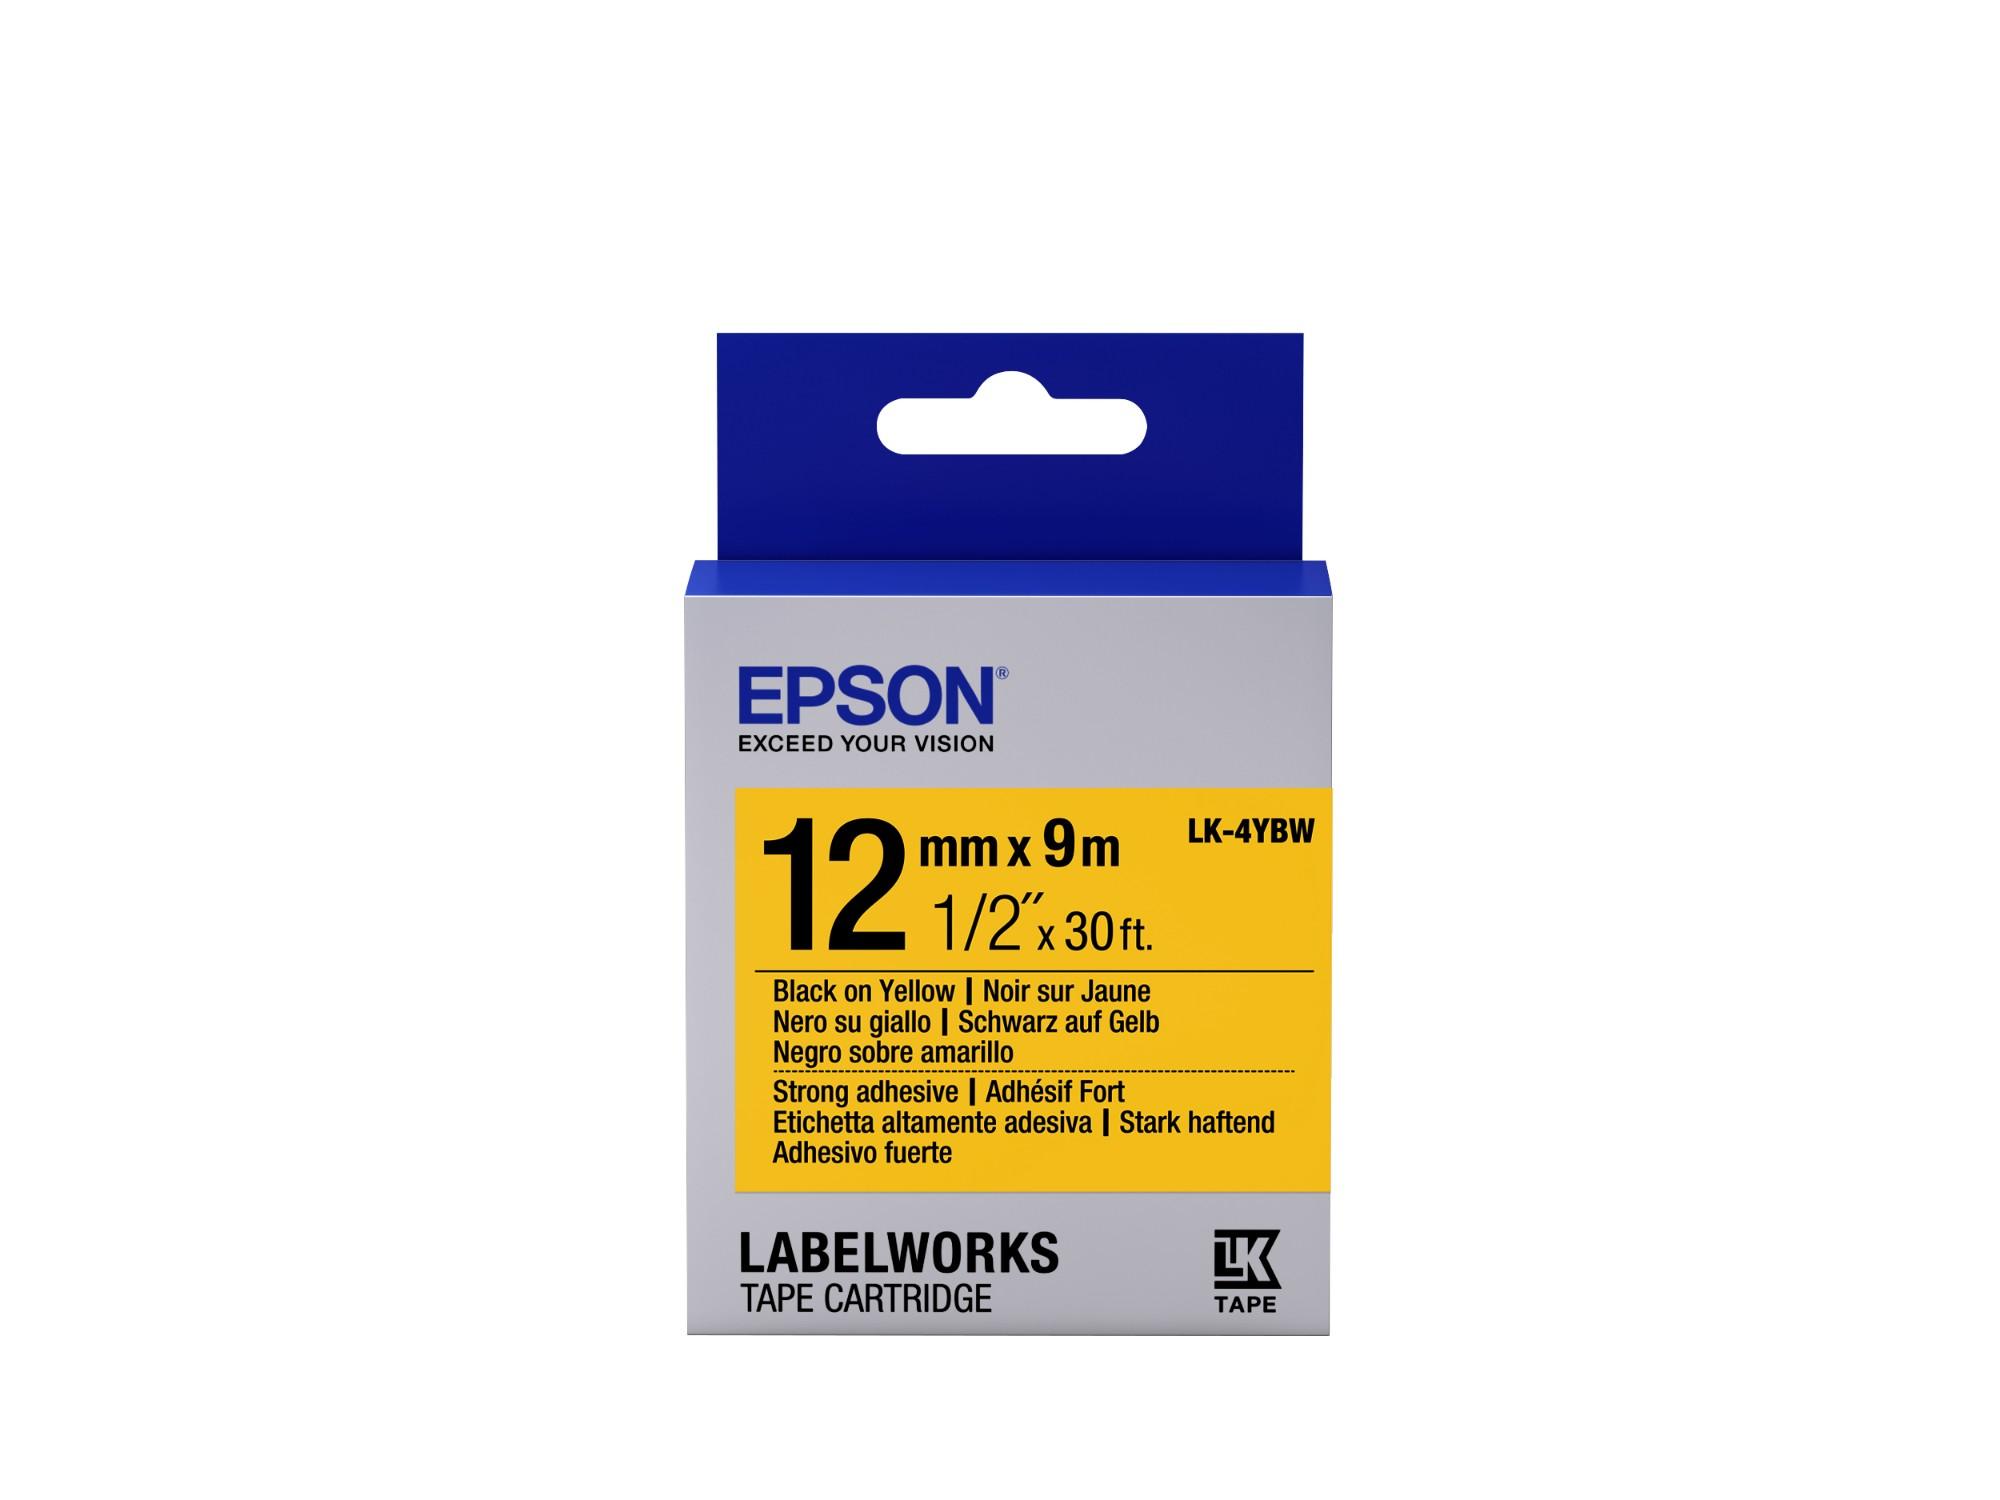 Epson Cinta adhesiva resistente - LK-4YBW cinta adhesiva resistente negra/amarilla 12/9